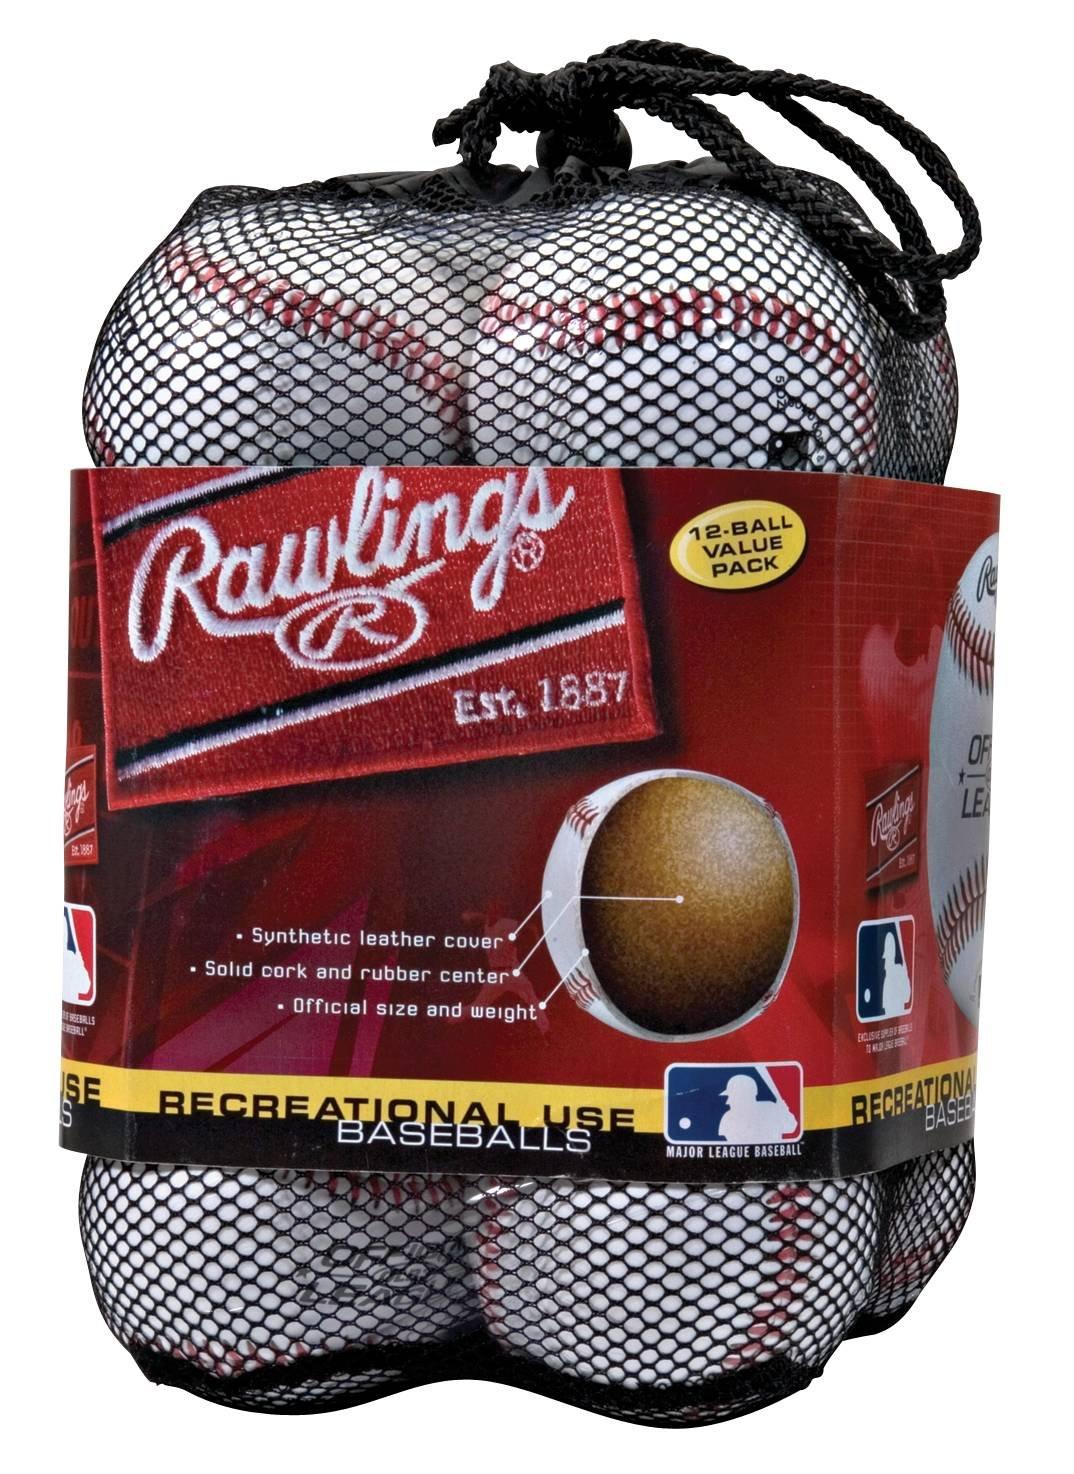 Rawlings Offizielle League Freizeitgebrauch Basebälle, Tasche von 12, menolb3bag12